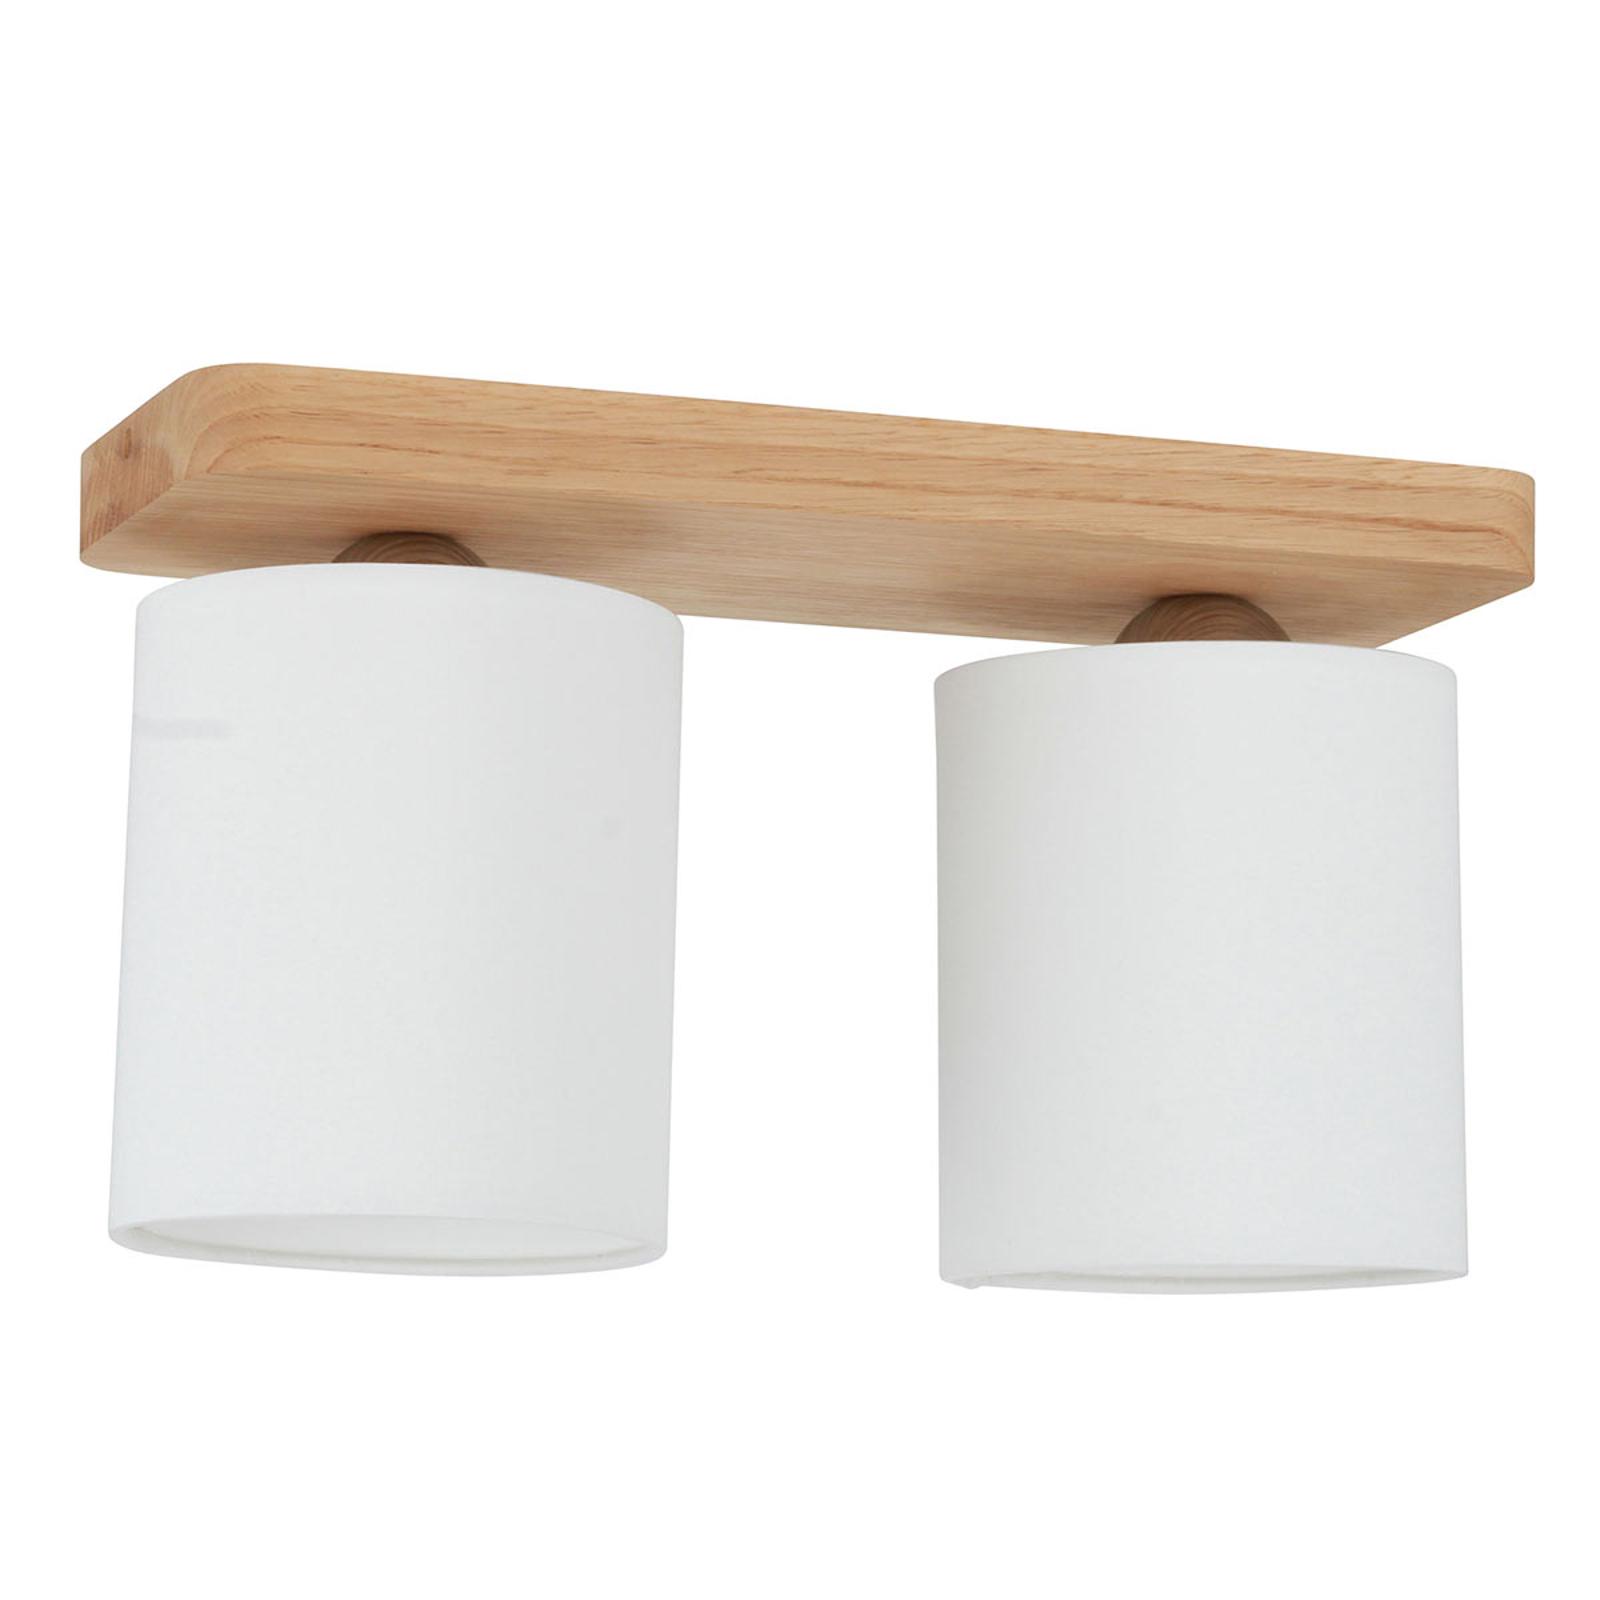 Taklampe Jenta 2 lyskilder